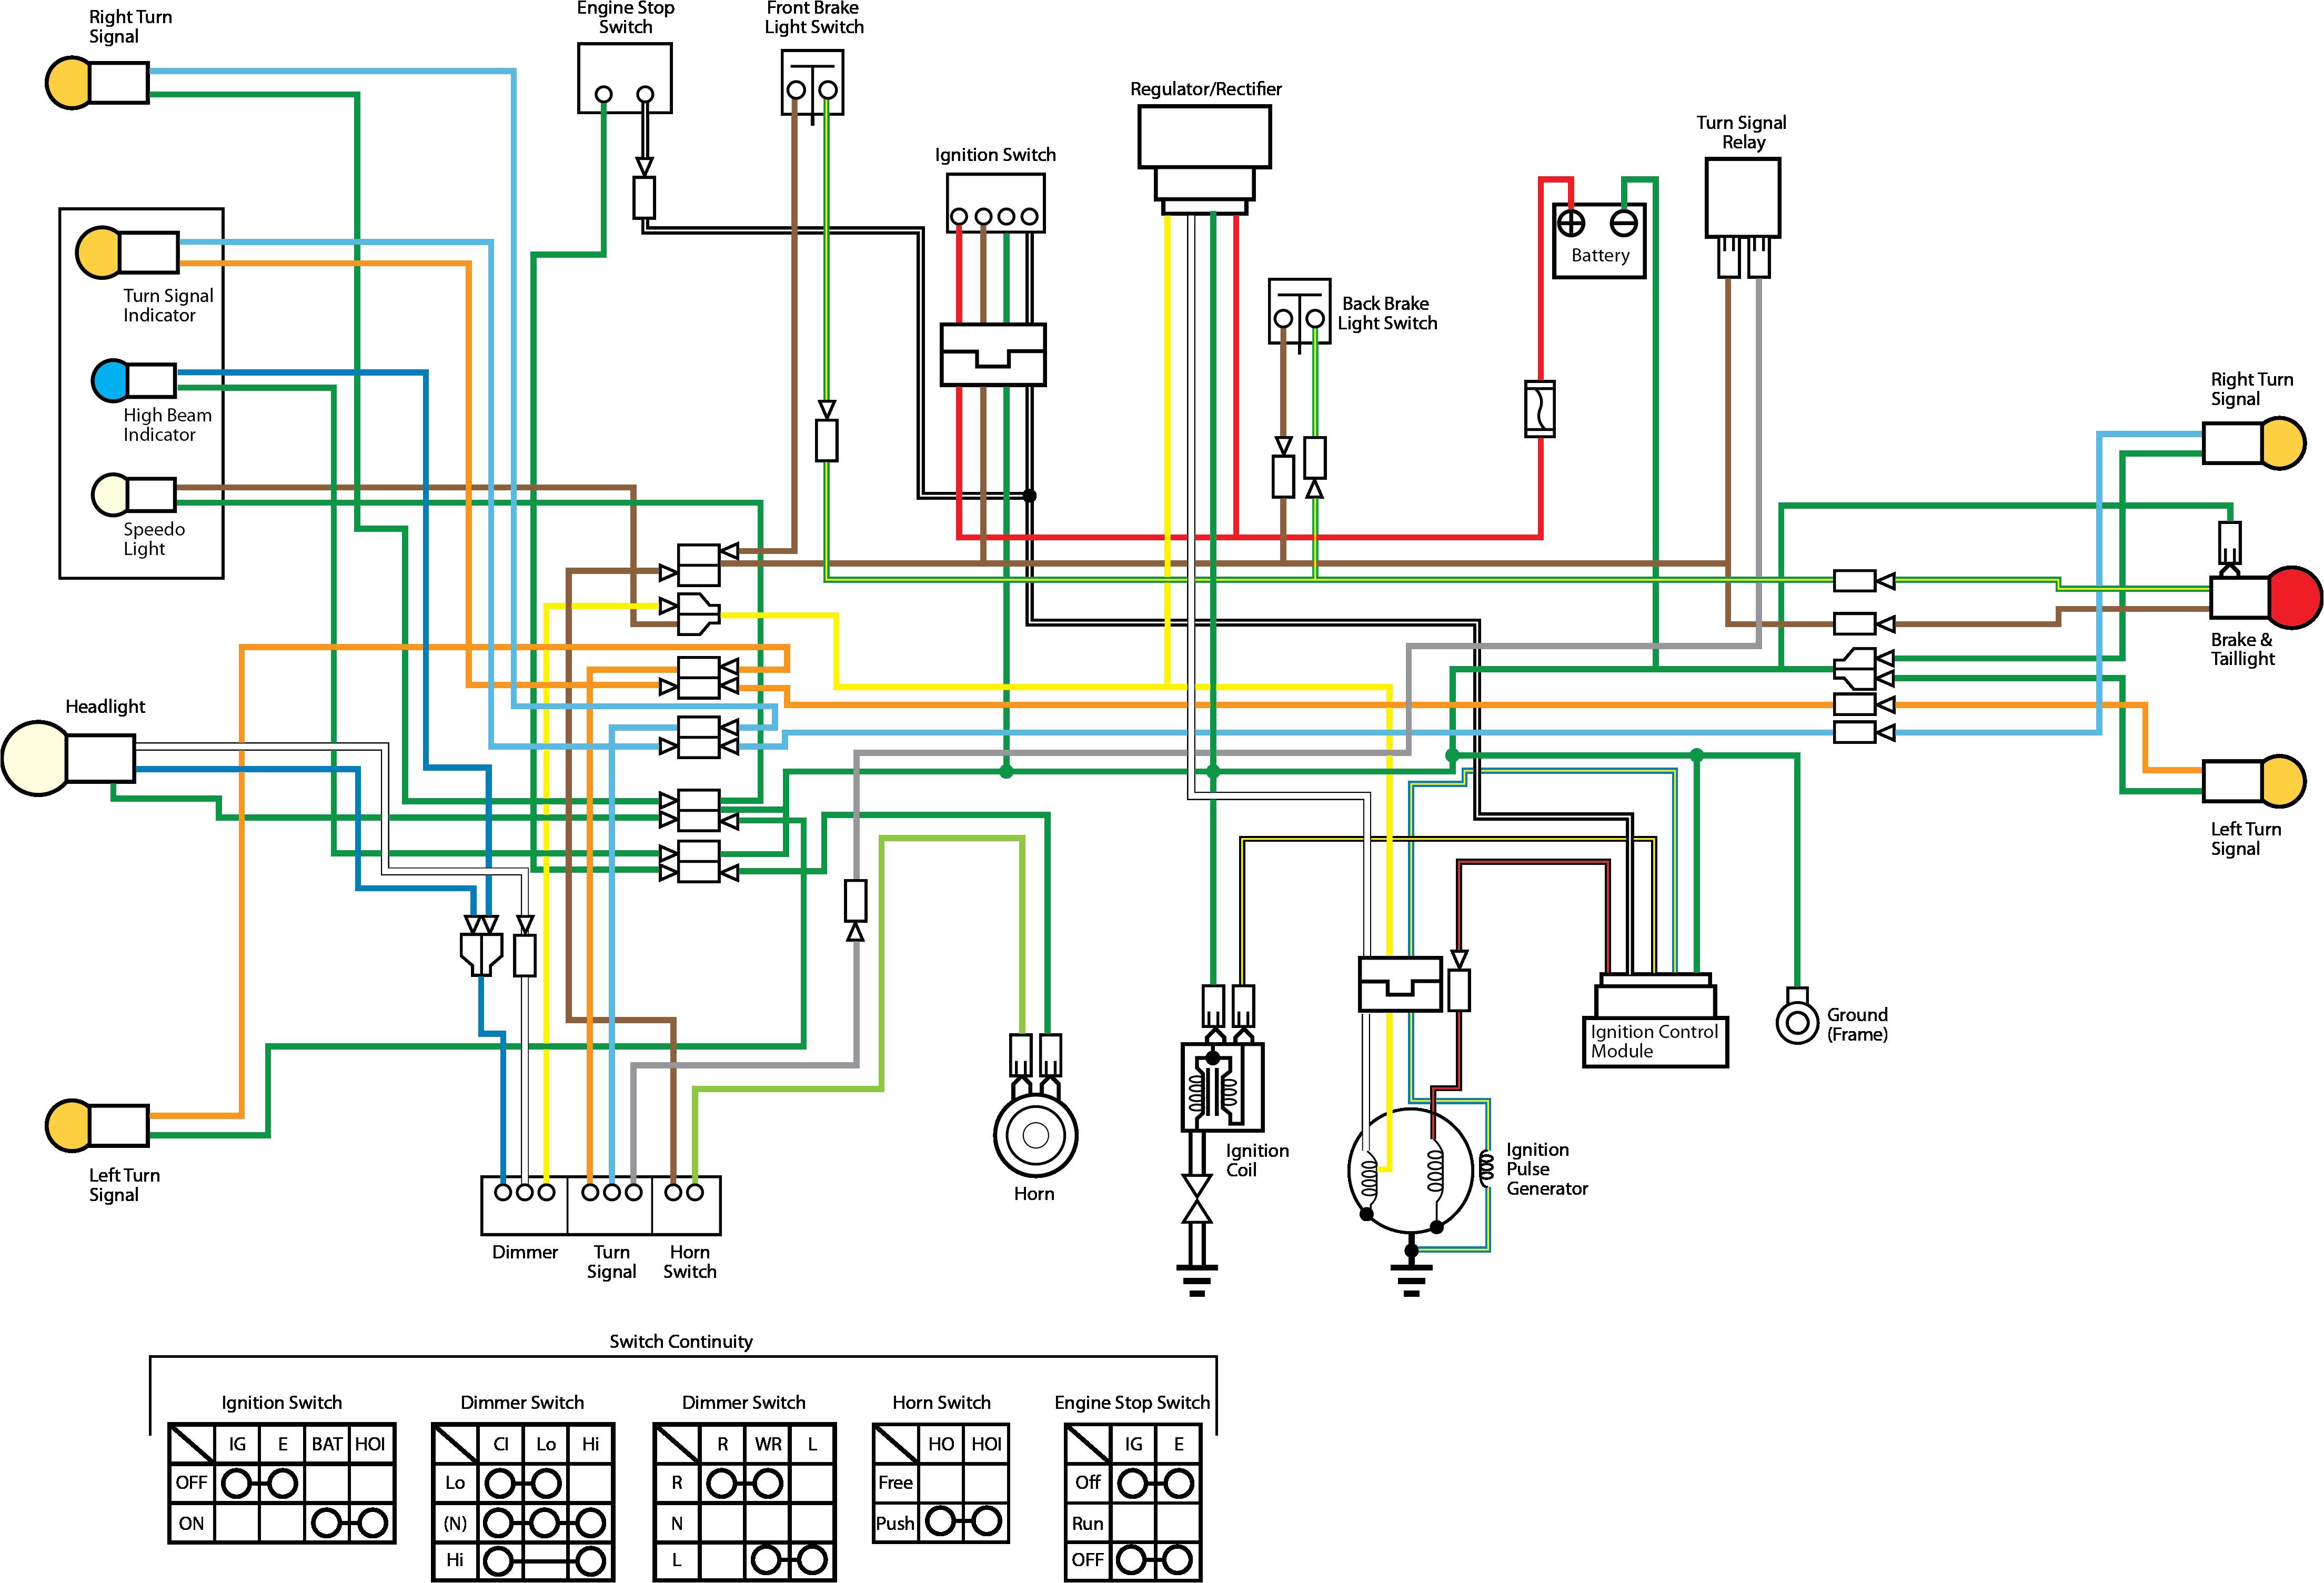 honda 125 wiring diagram wiring diagram reviewhonda 125 wiring diagram wiring diagram mega honda wave 125